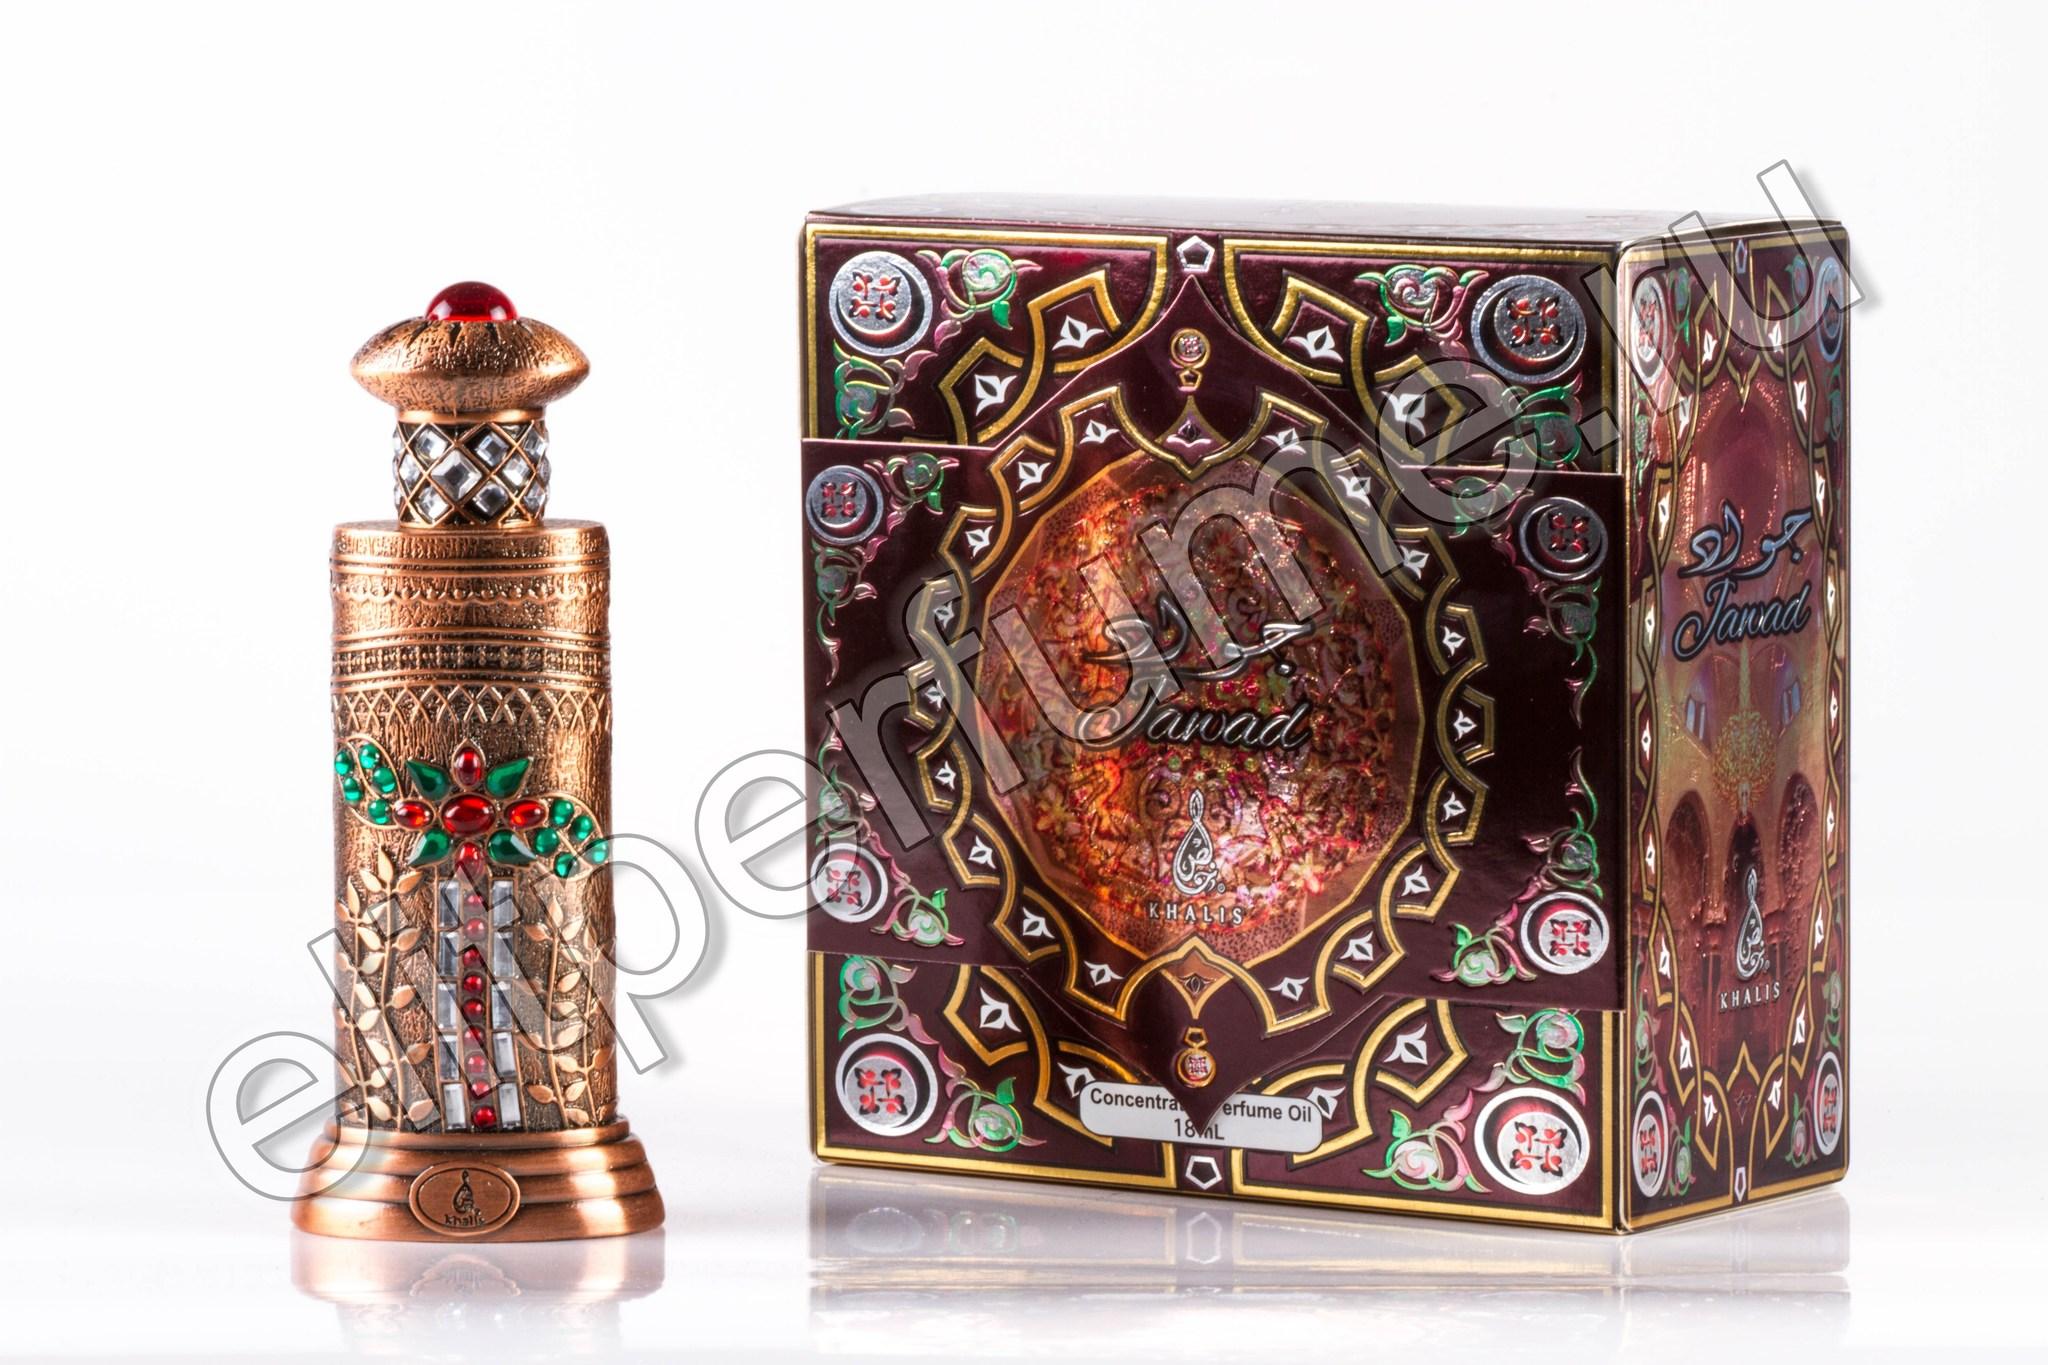 Jawad Джавад 18 мл Унисекс арабские масляные духи от Халис Khalis Perfumes